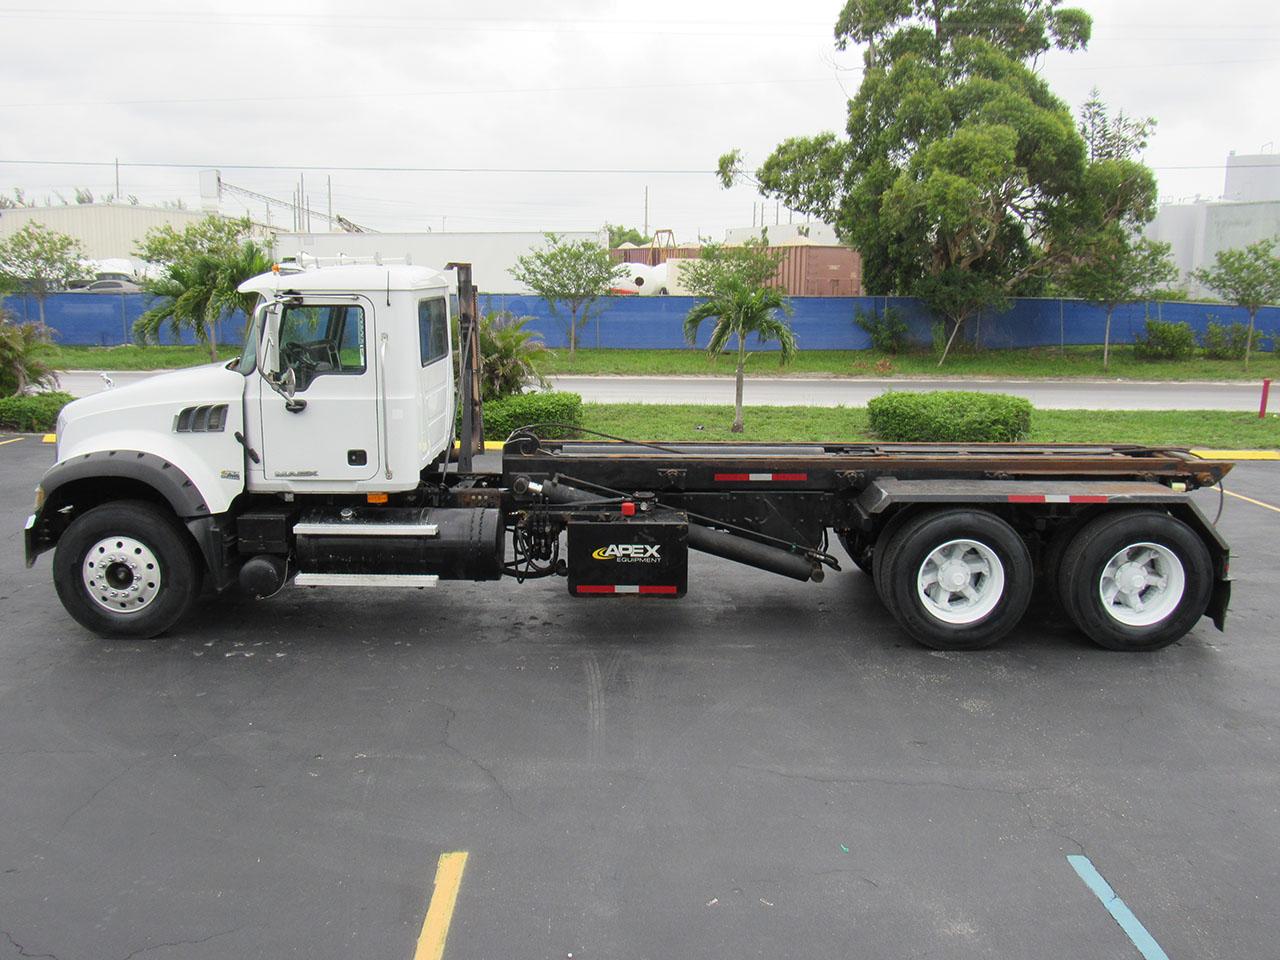 used 2009 Mack Granite in West Palm Beach, FL